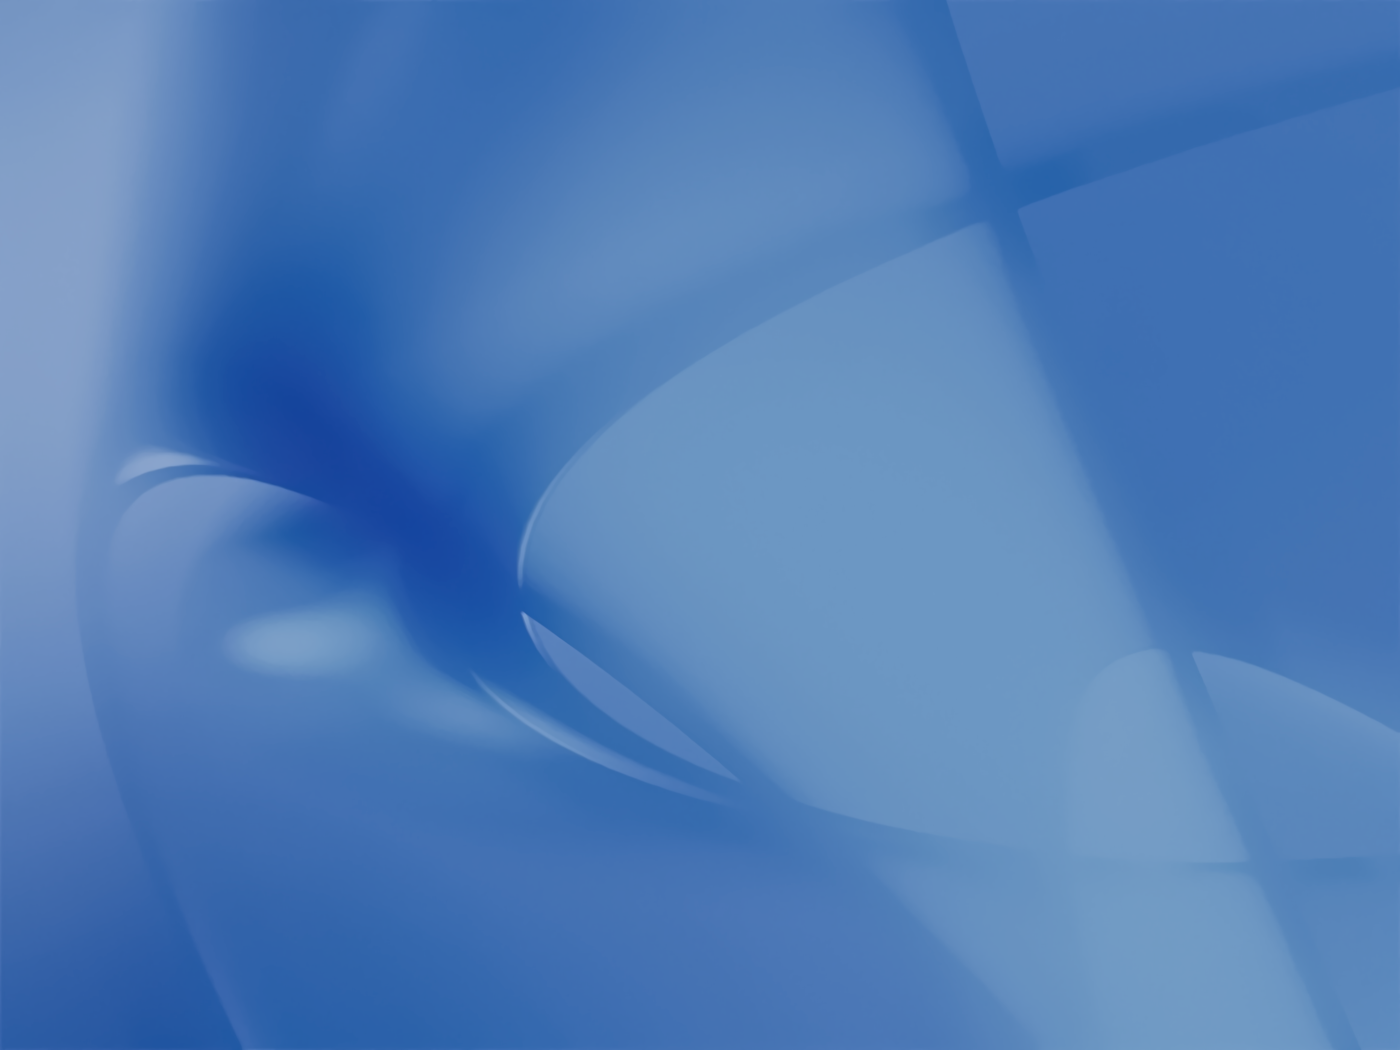 Every Default Macos Wallpaper In Glorious 5k Resolution 512 Pixels